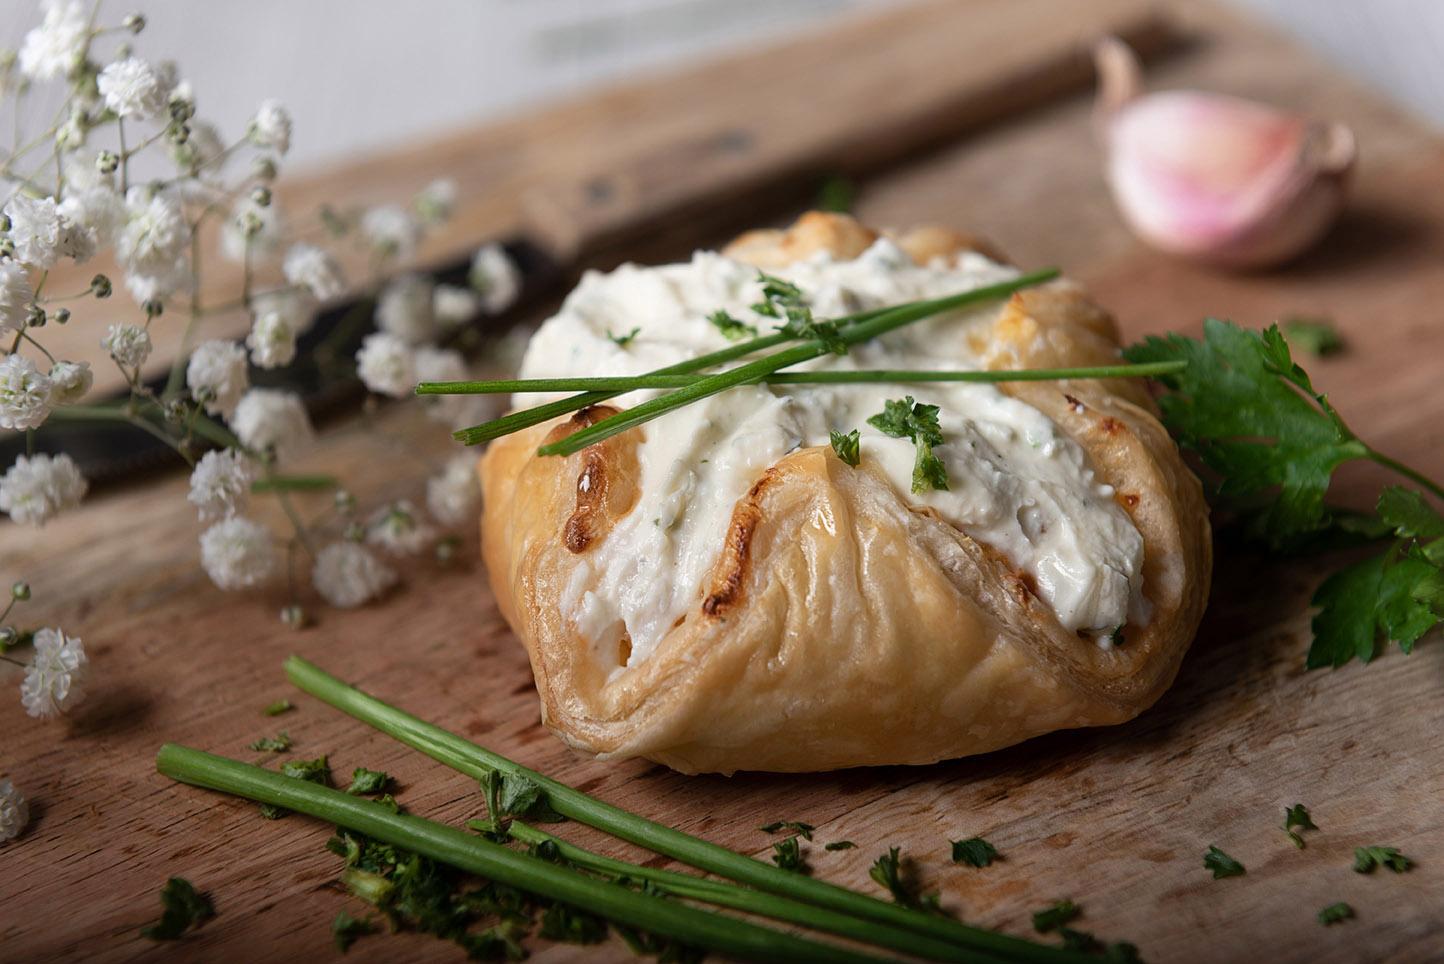 Photographe culinaire Quimper